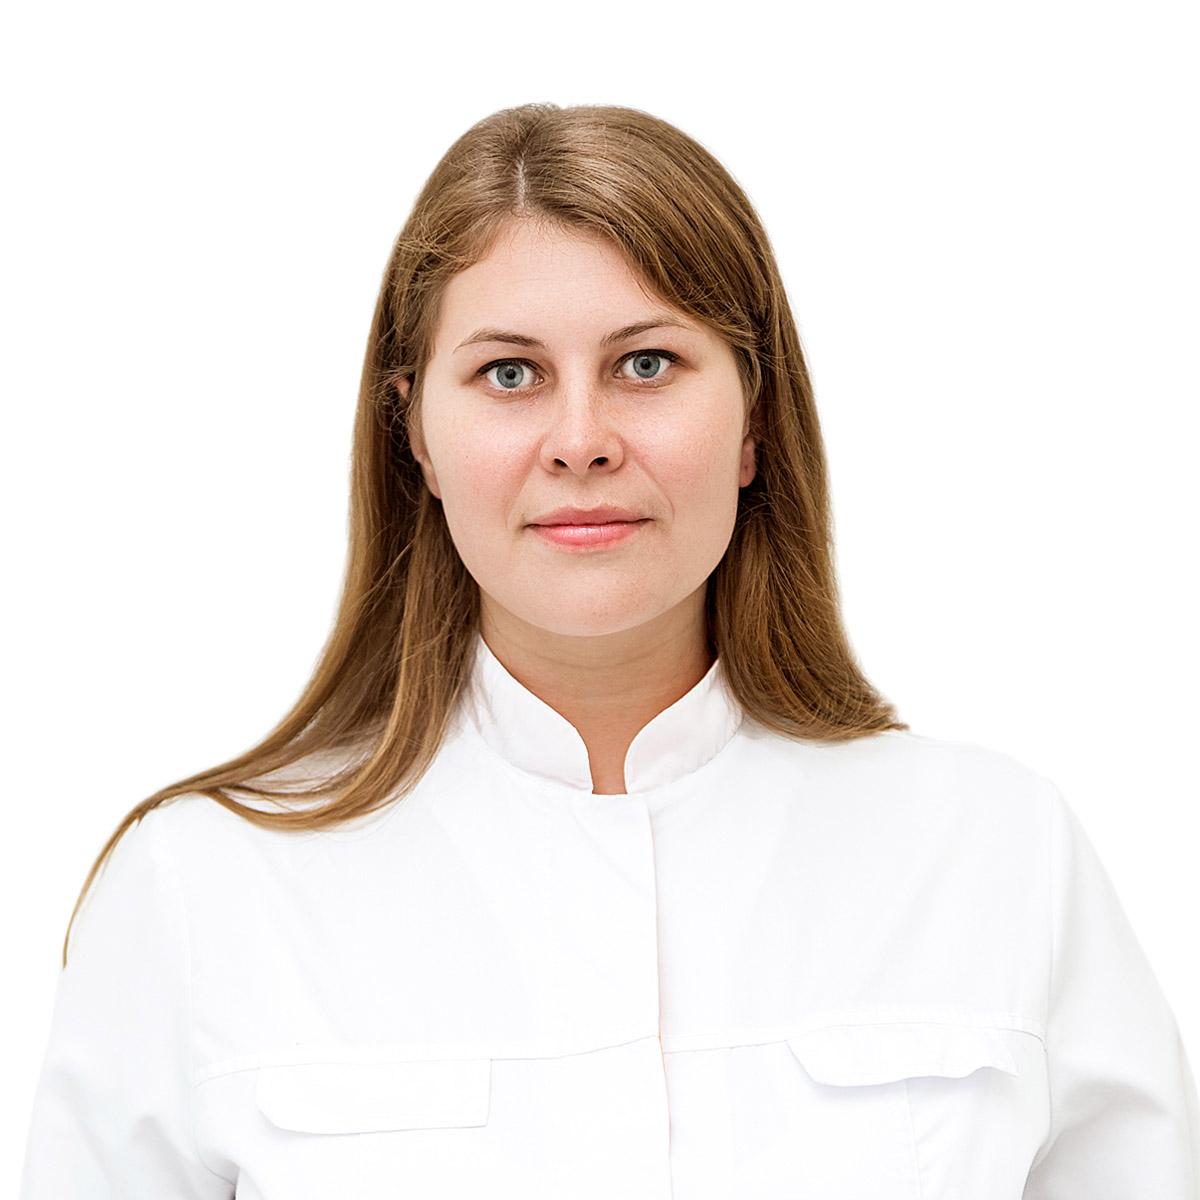 Вересова Мария Николаевна